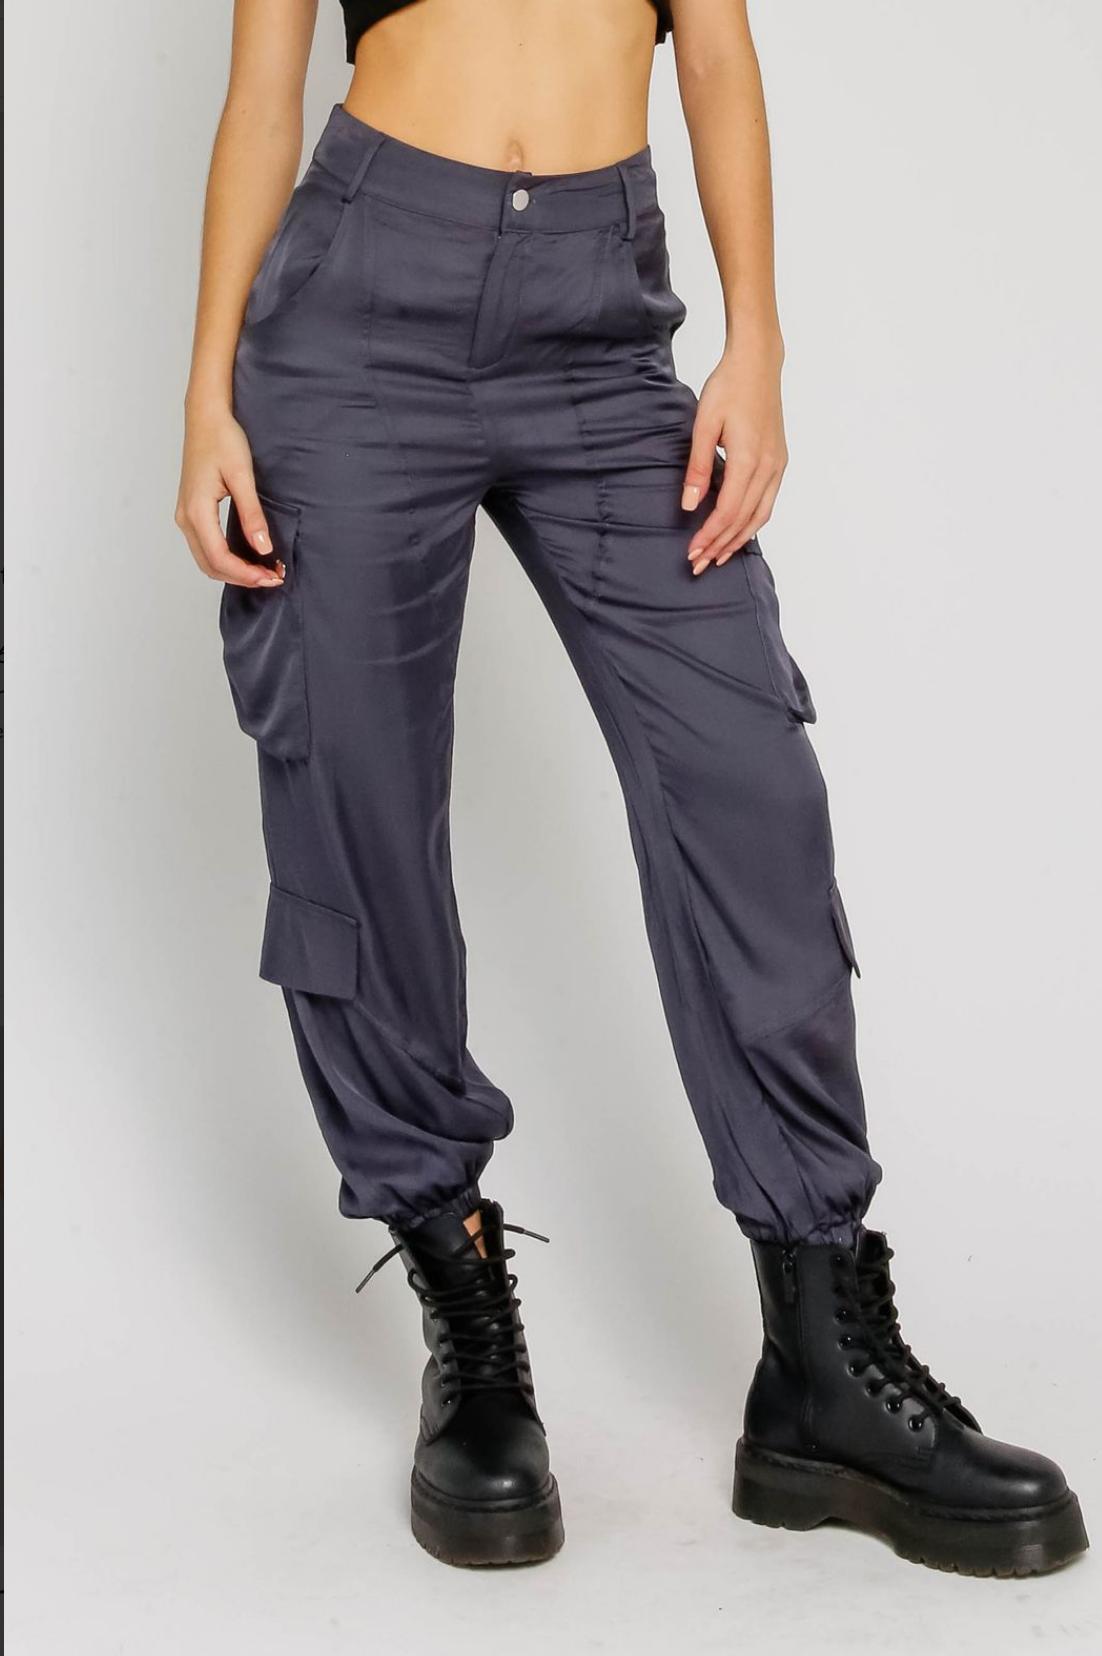 Atikshop Satin Cargo Pants